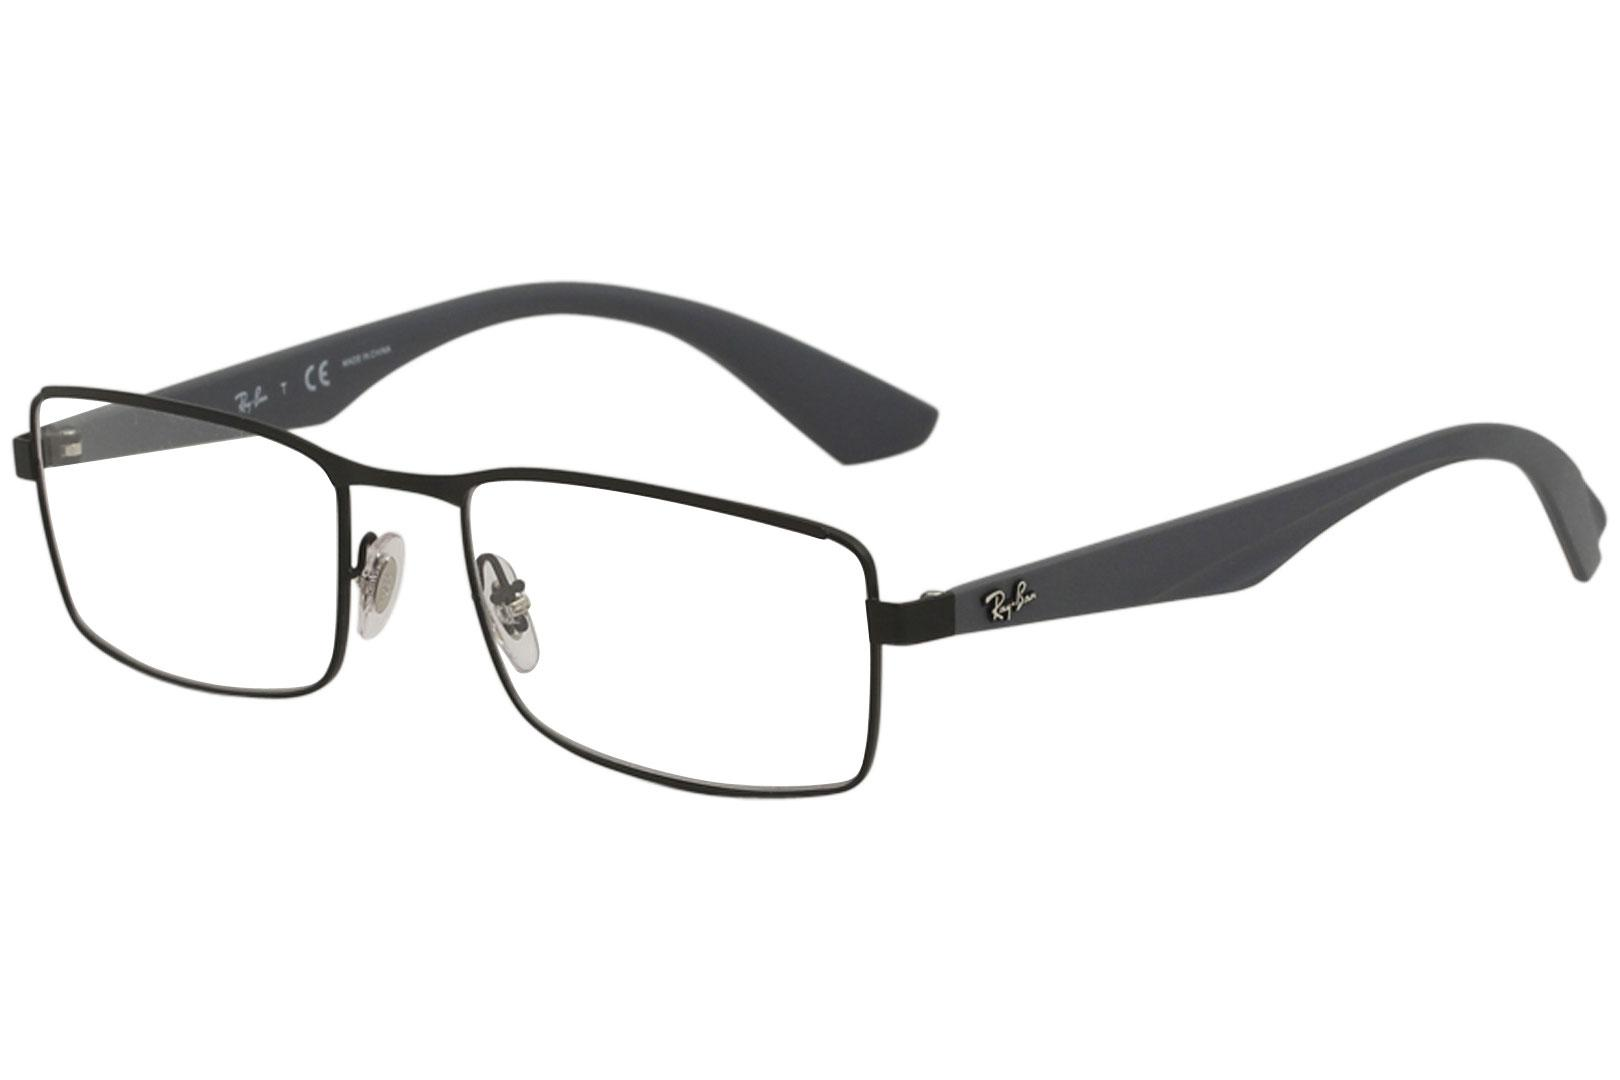 9292497594c7 Ray Ban Eyeglasses RX6332 RX 6332 2822 Matte Black Full Rim Optical ...